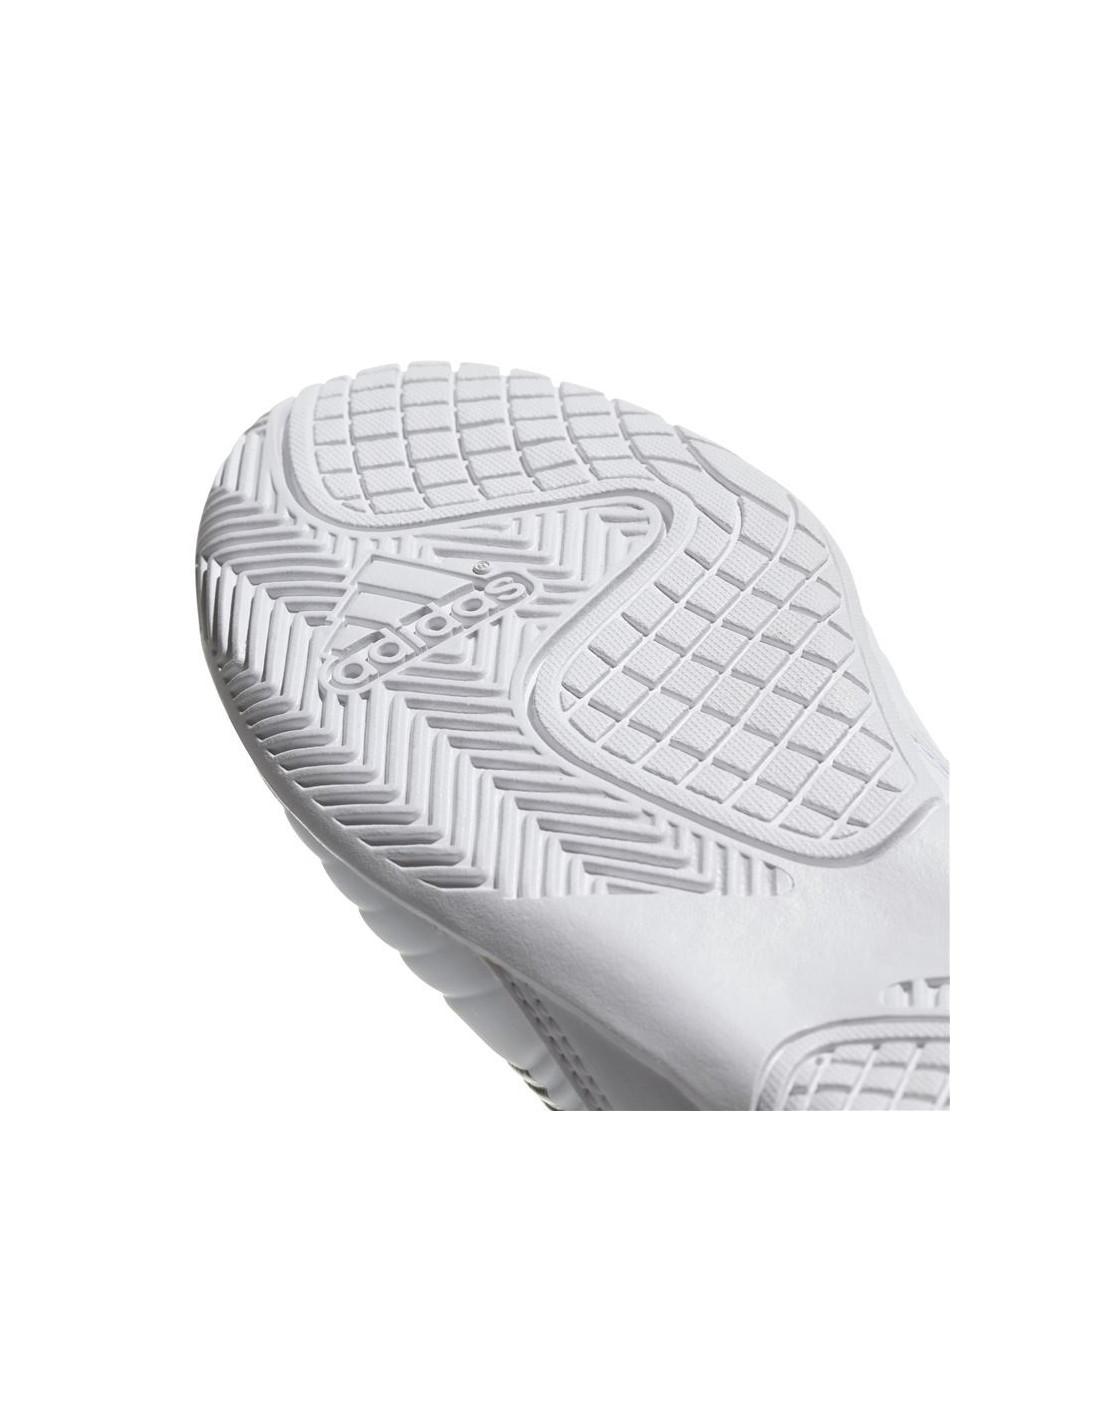 ᐈ Zapatillas de Fútbol Sala adidas Predator Tango 18.3